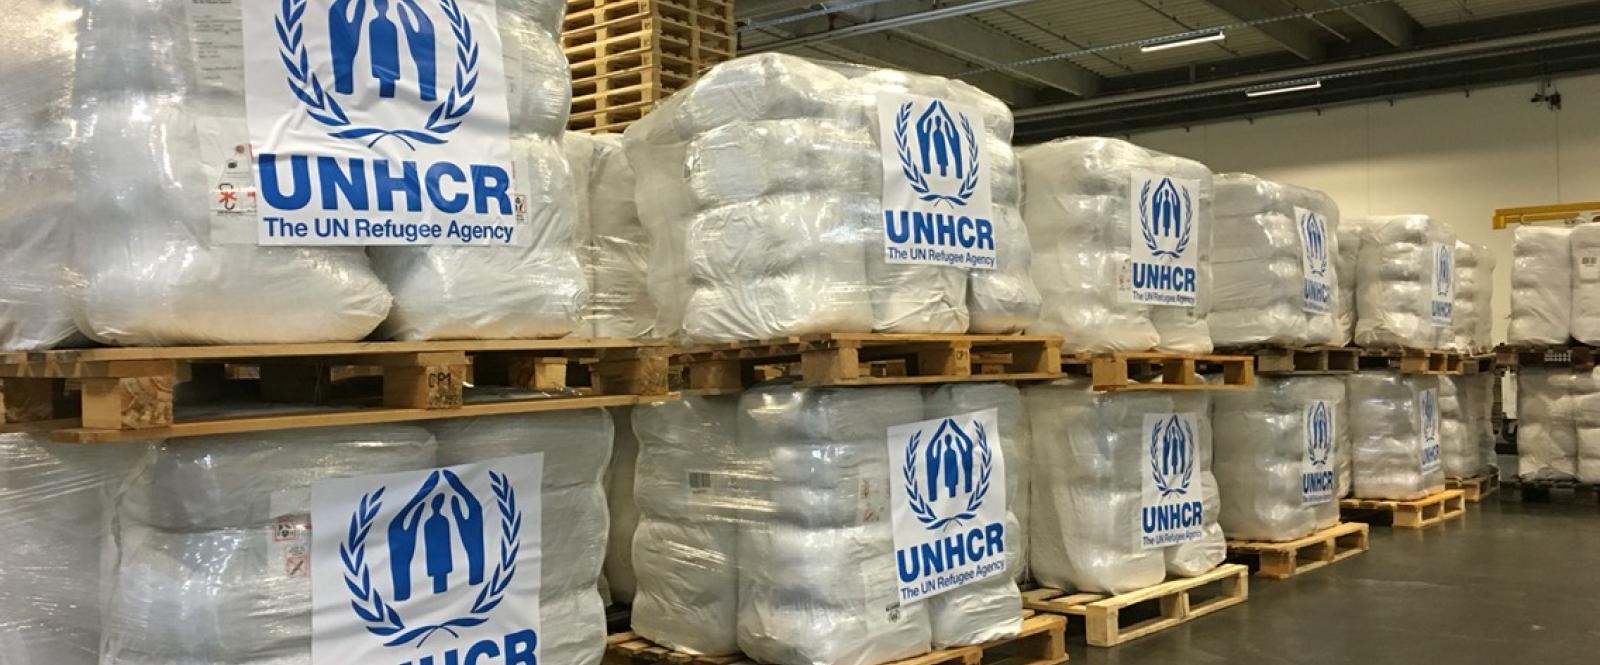 УВКБ ООН агентство ООН по делам беженцев